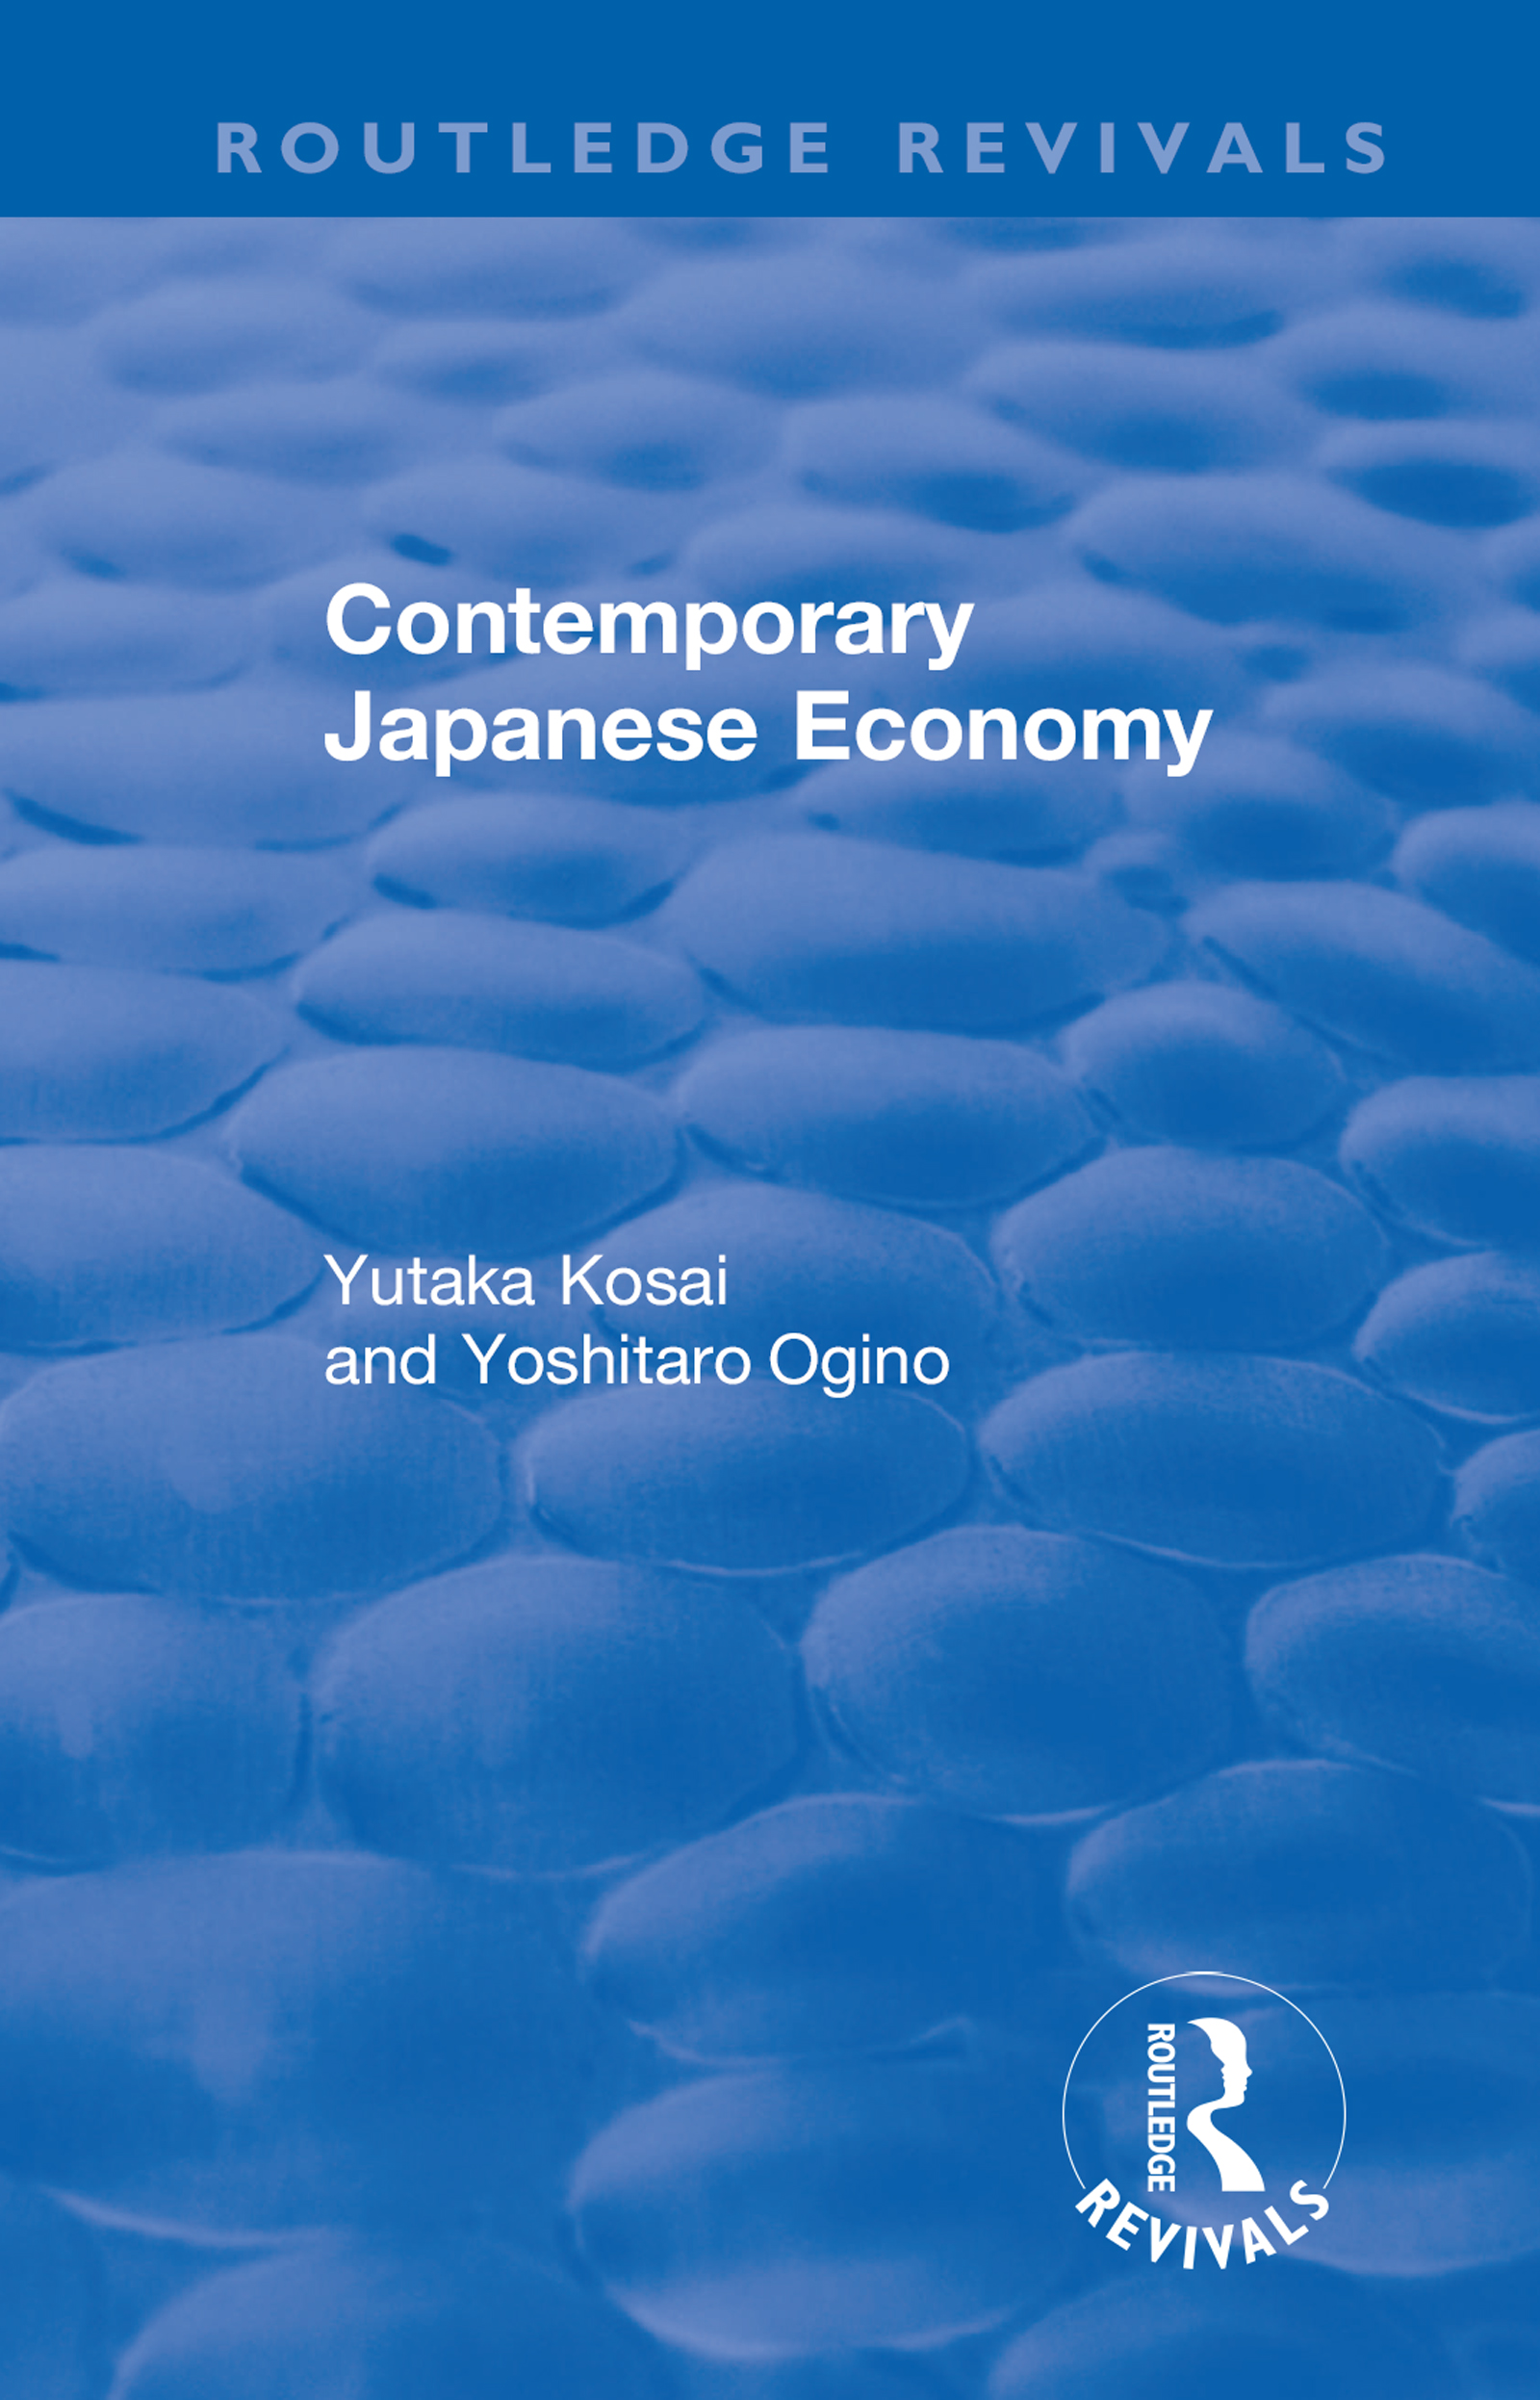 The Contemporary Japanese Economy